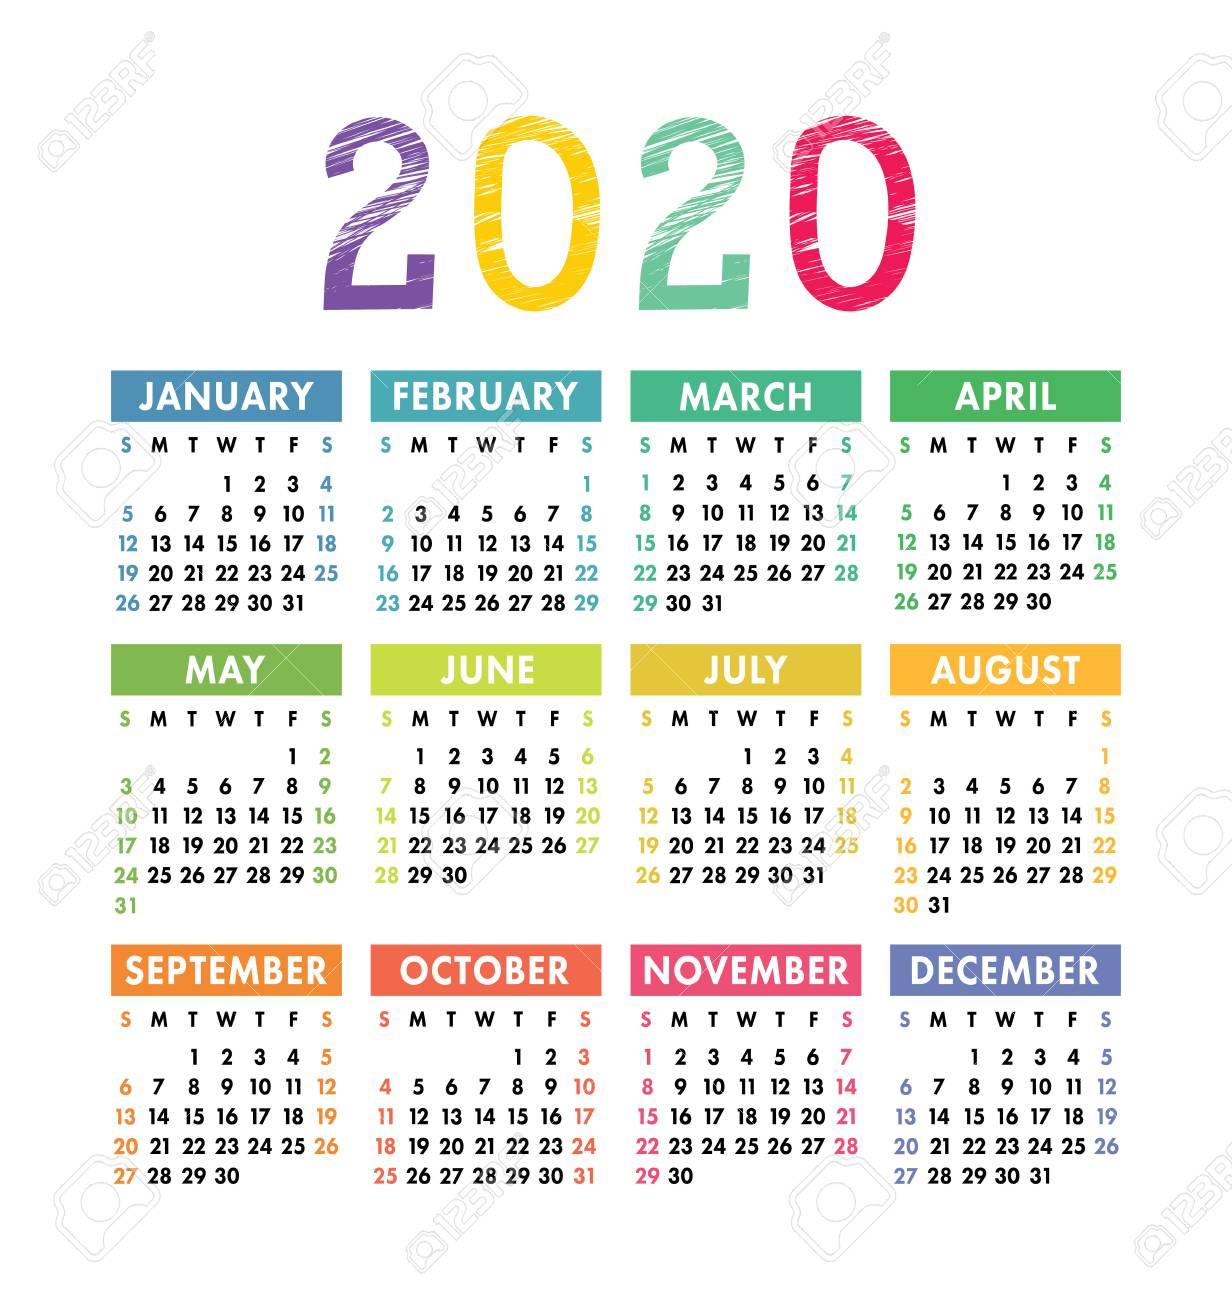 Printable Pocket Calendar 2020 - Wpa.wpart.co with regard to Printable Pocket Calendar Free 2020